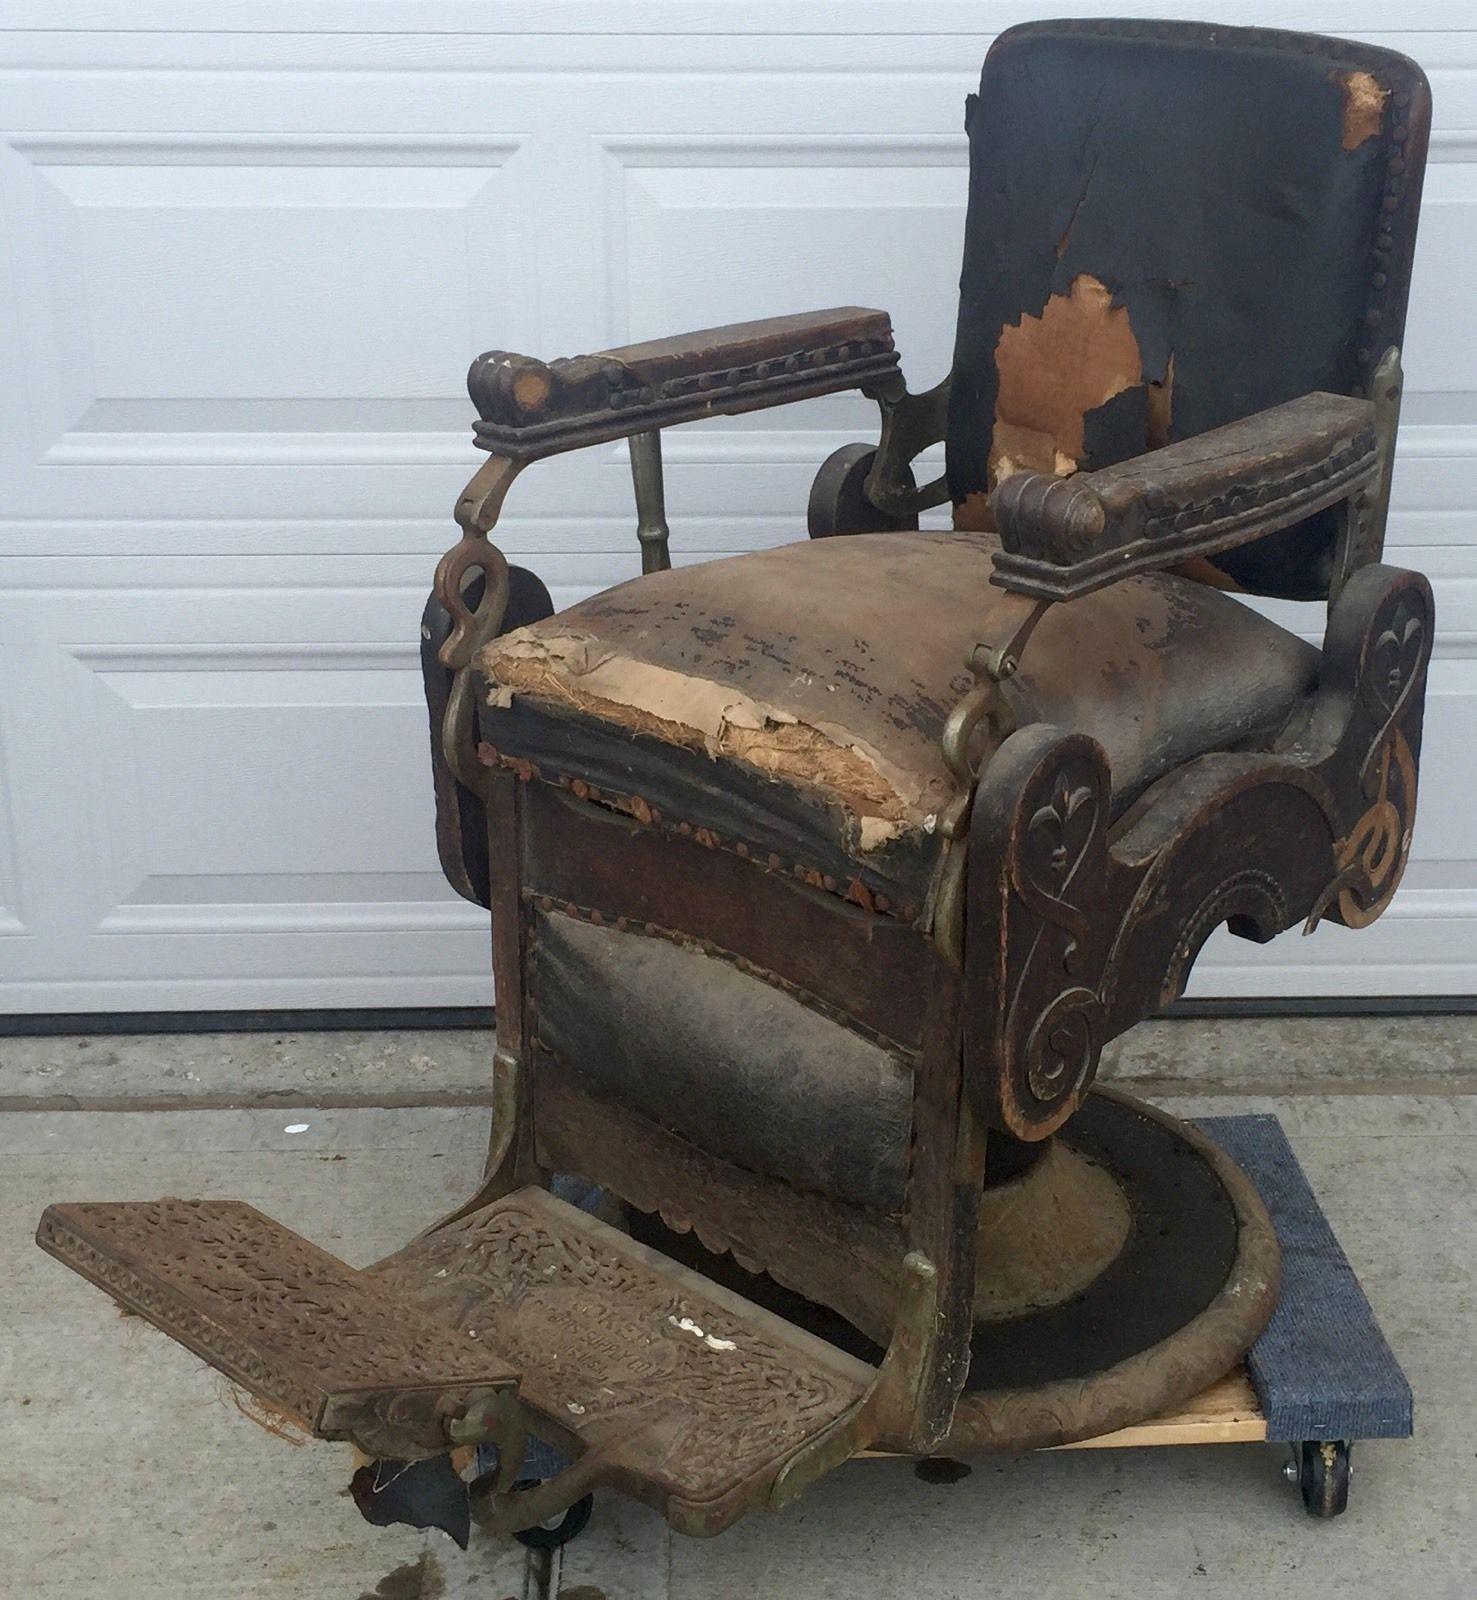 RARE Antique Oak Congress Style Koken Barber Shop Chair 1901 Working  Hydraulics | eBay - Rare Antique Oak Congress Style Koken Barber Shop Chair 1901 Working